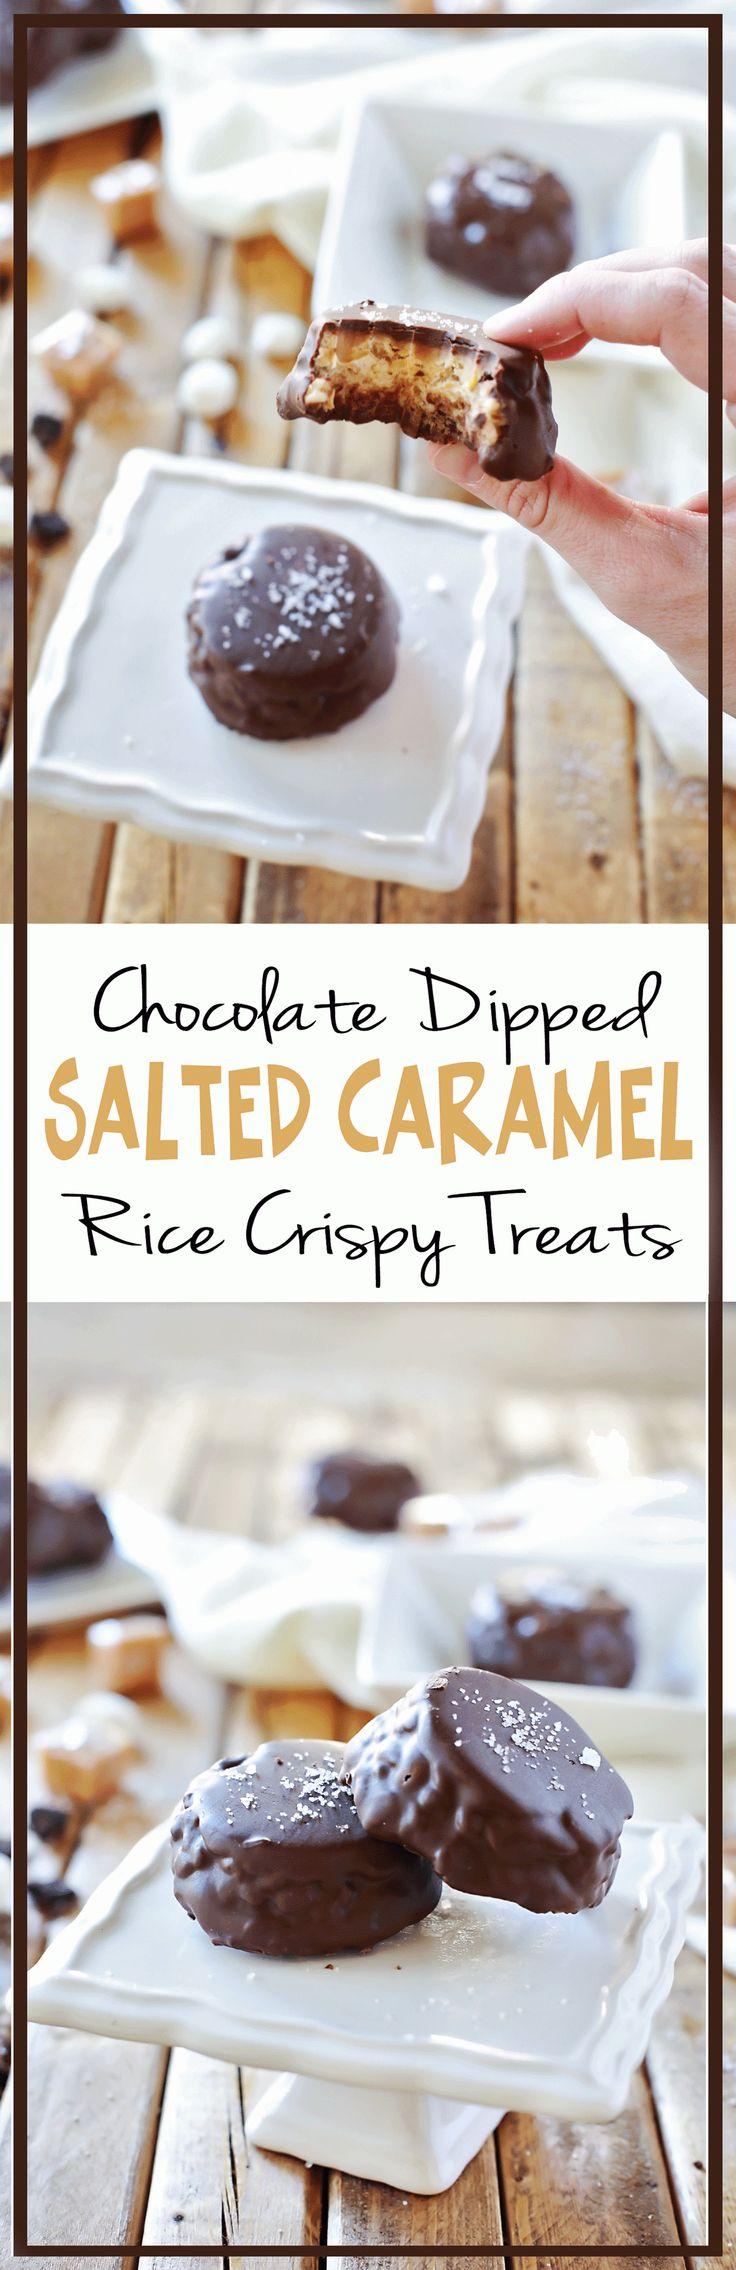 Chocolate Covered Gesalzene Karamell-Reis-Crispy Treats durch Flirten mit Flavor